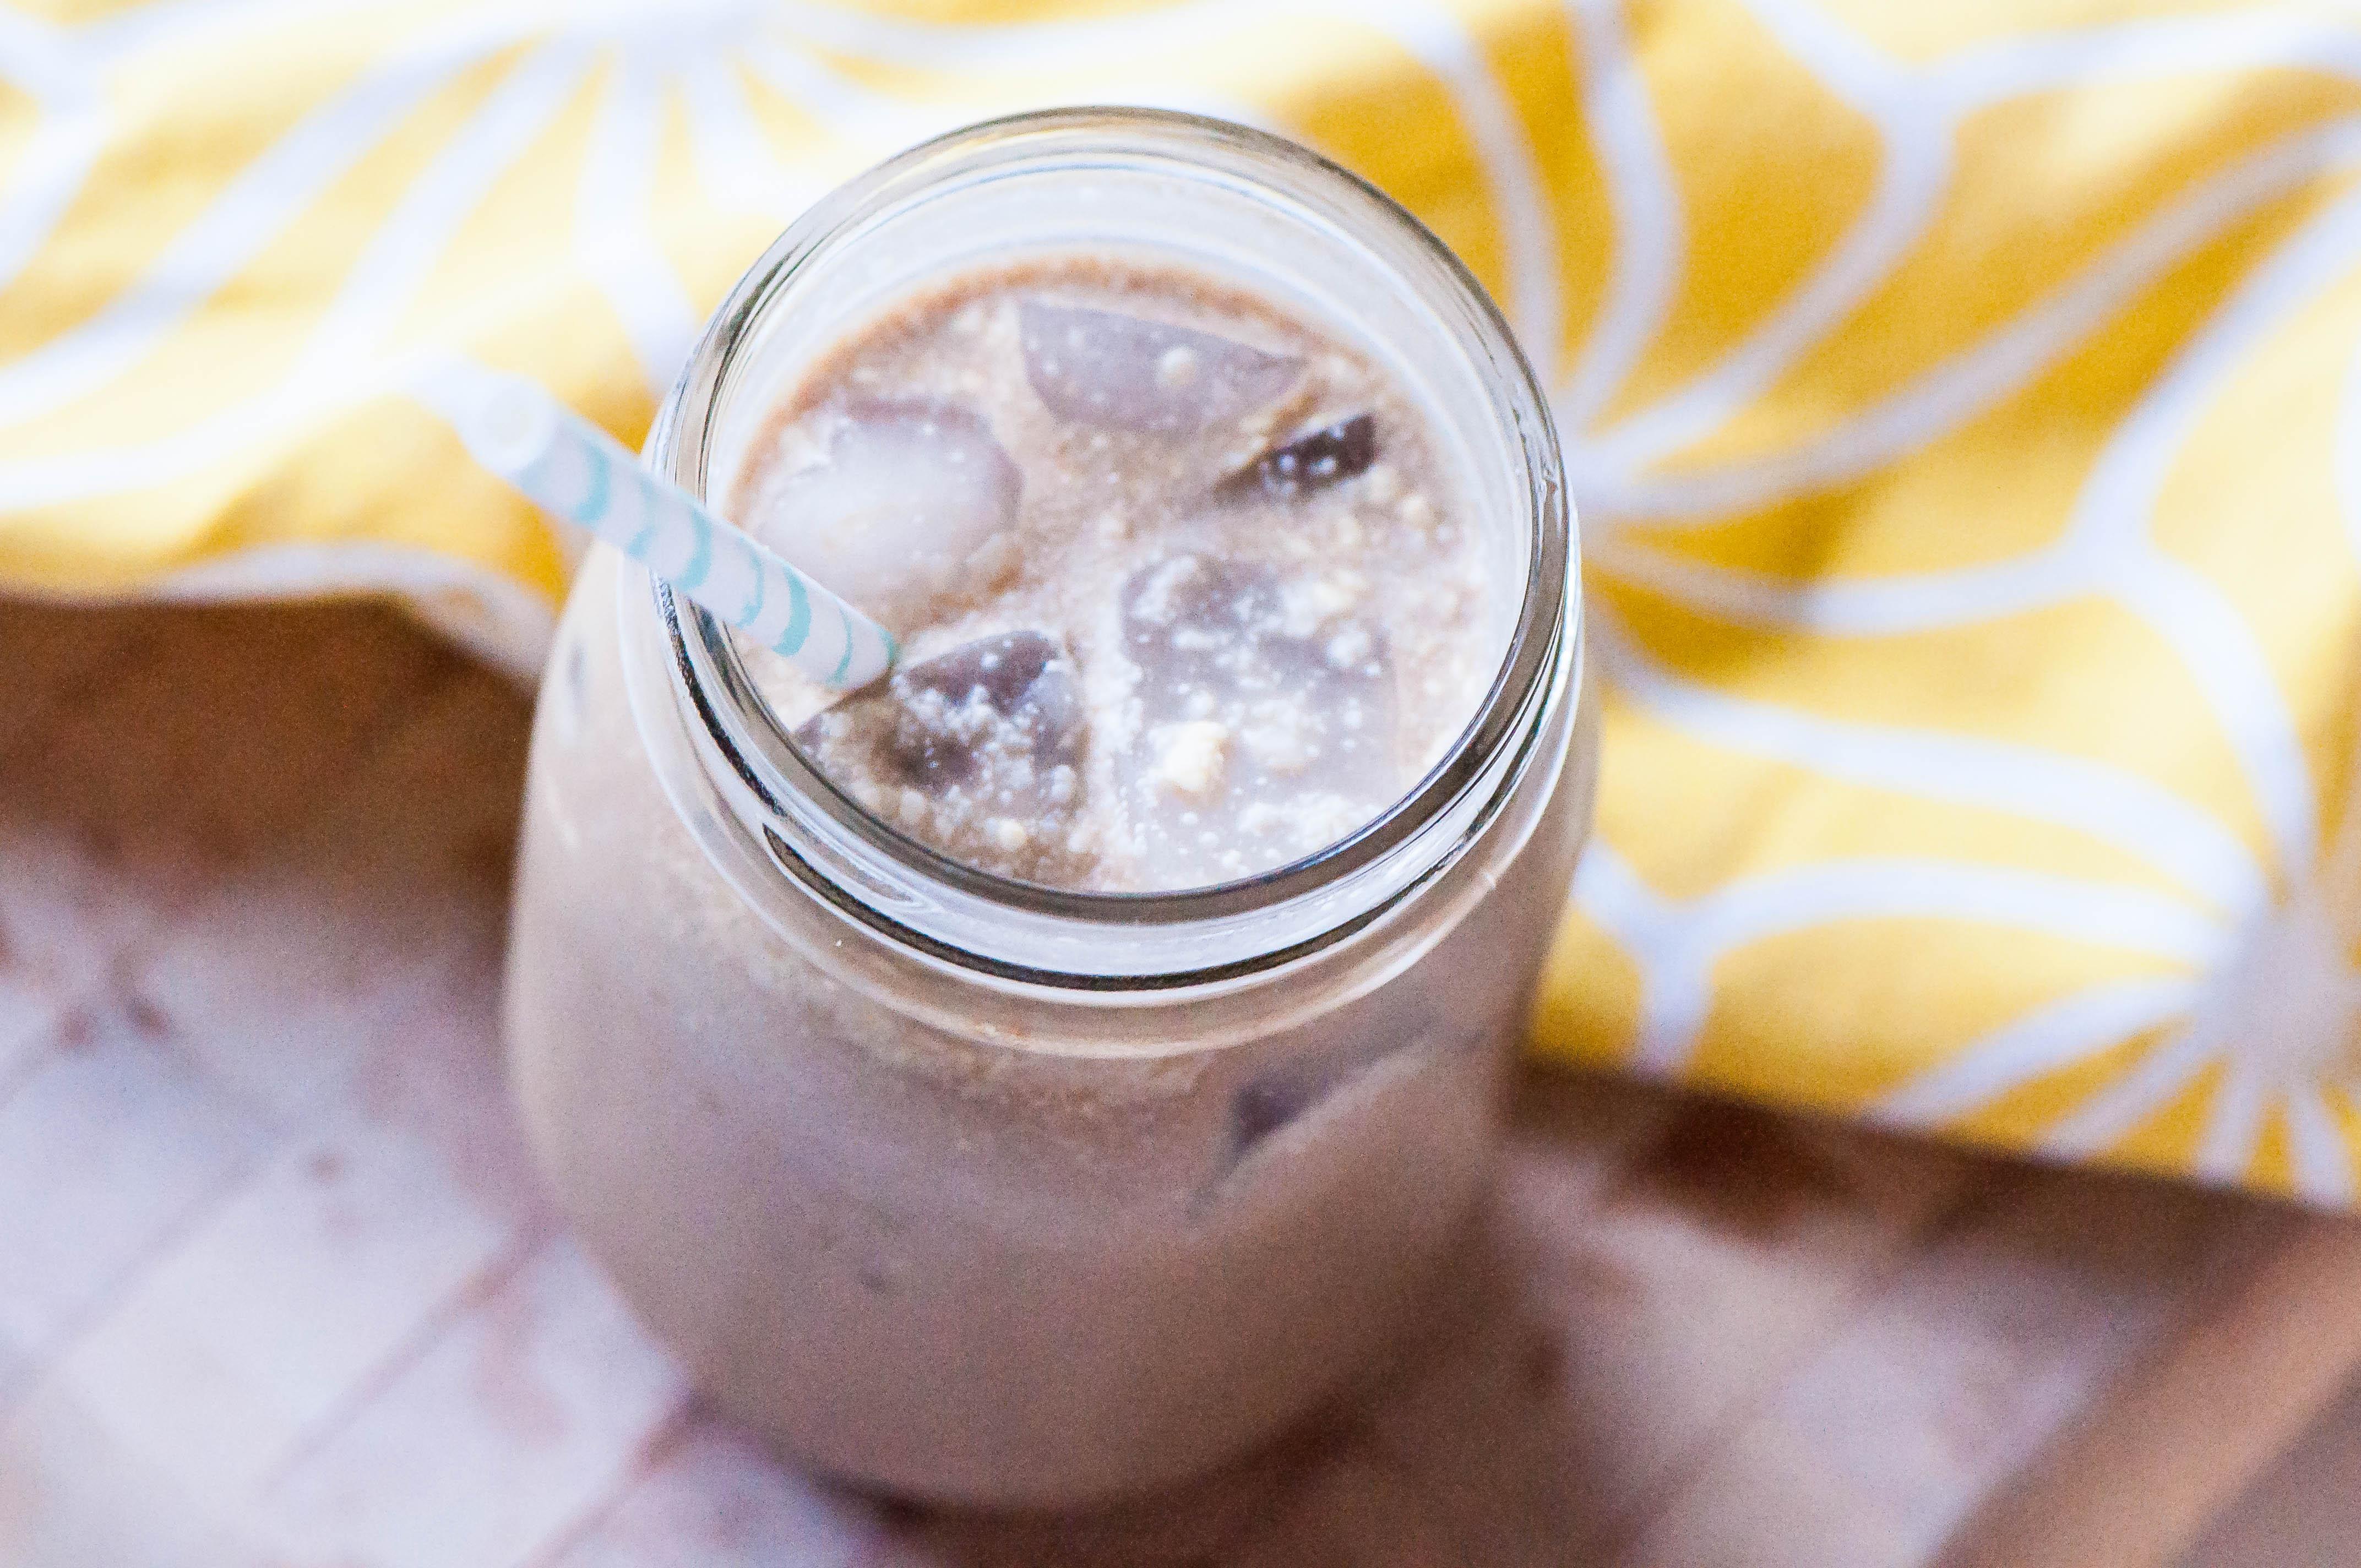 Creamy Coconut Iced Coffee